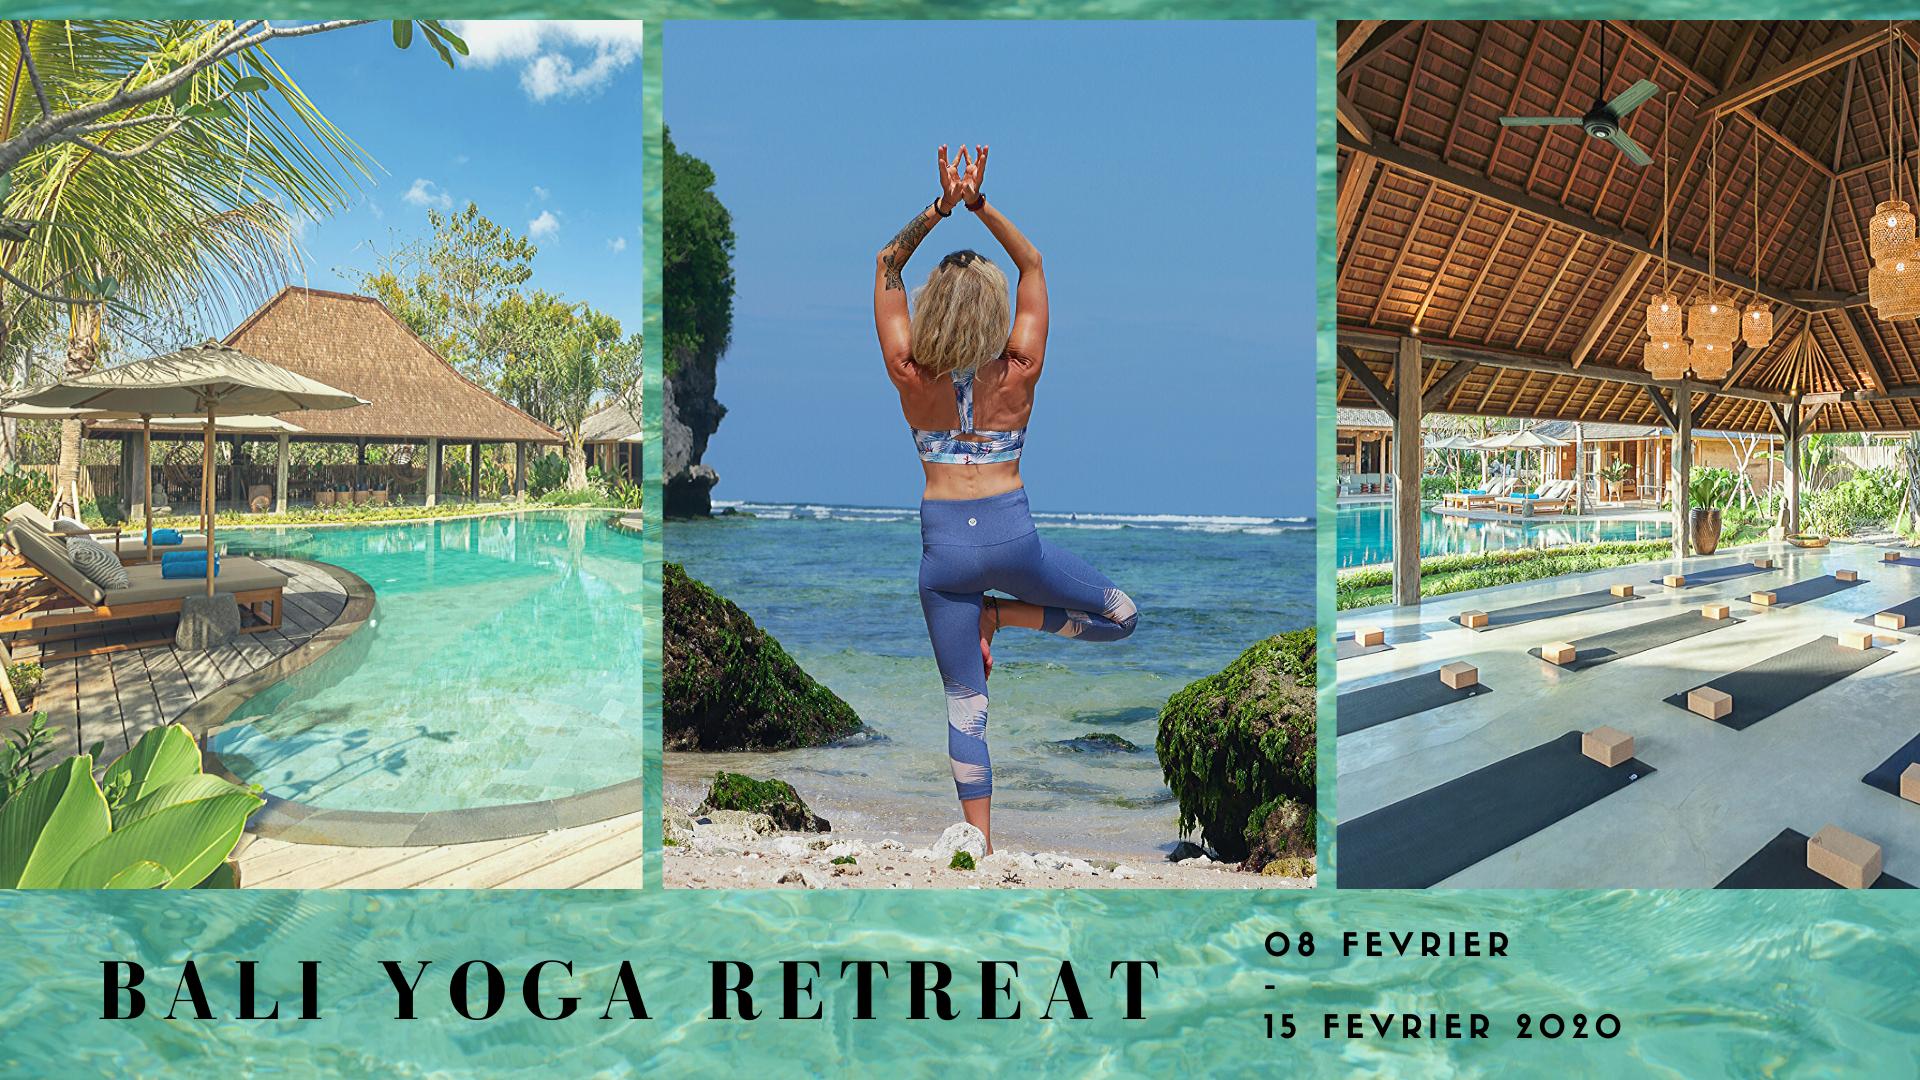 Retraite Bali Vibes Yoga Bingin